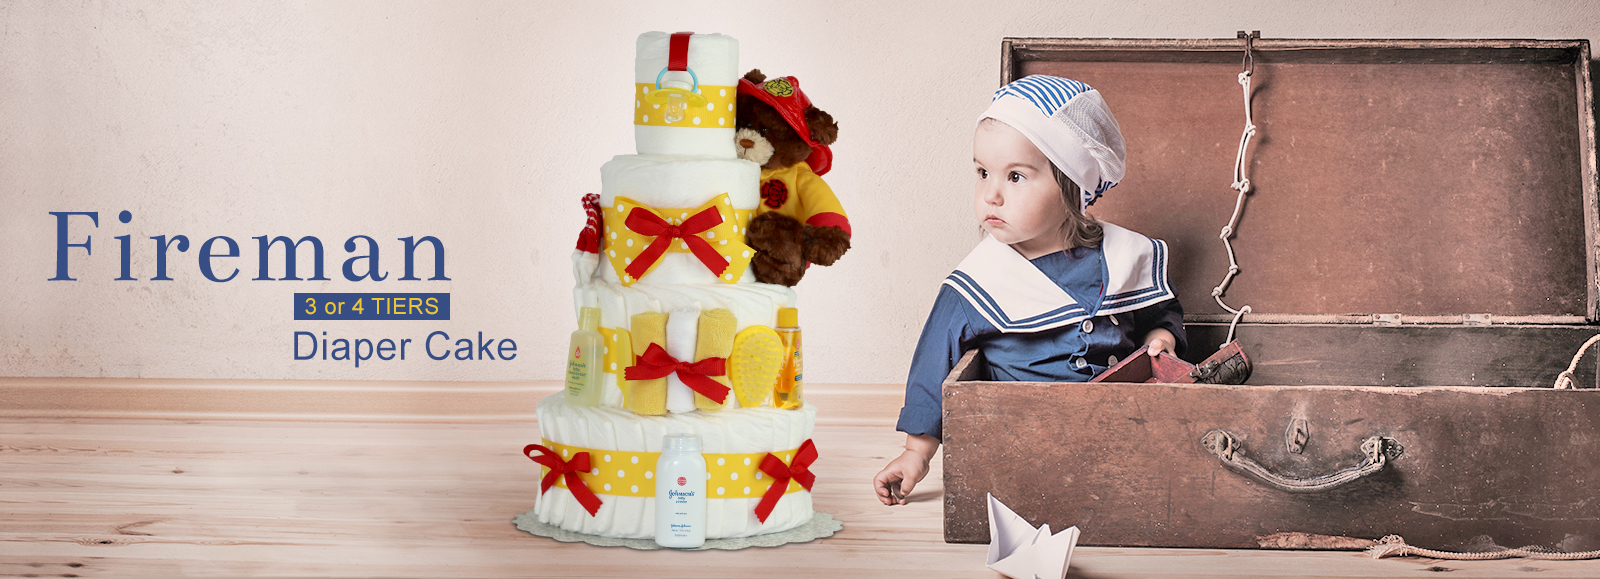 Fireman 3 or 4 Tiers Diaper Cake